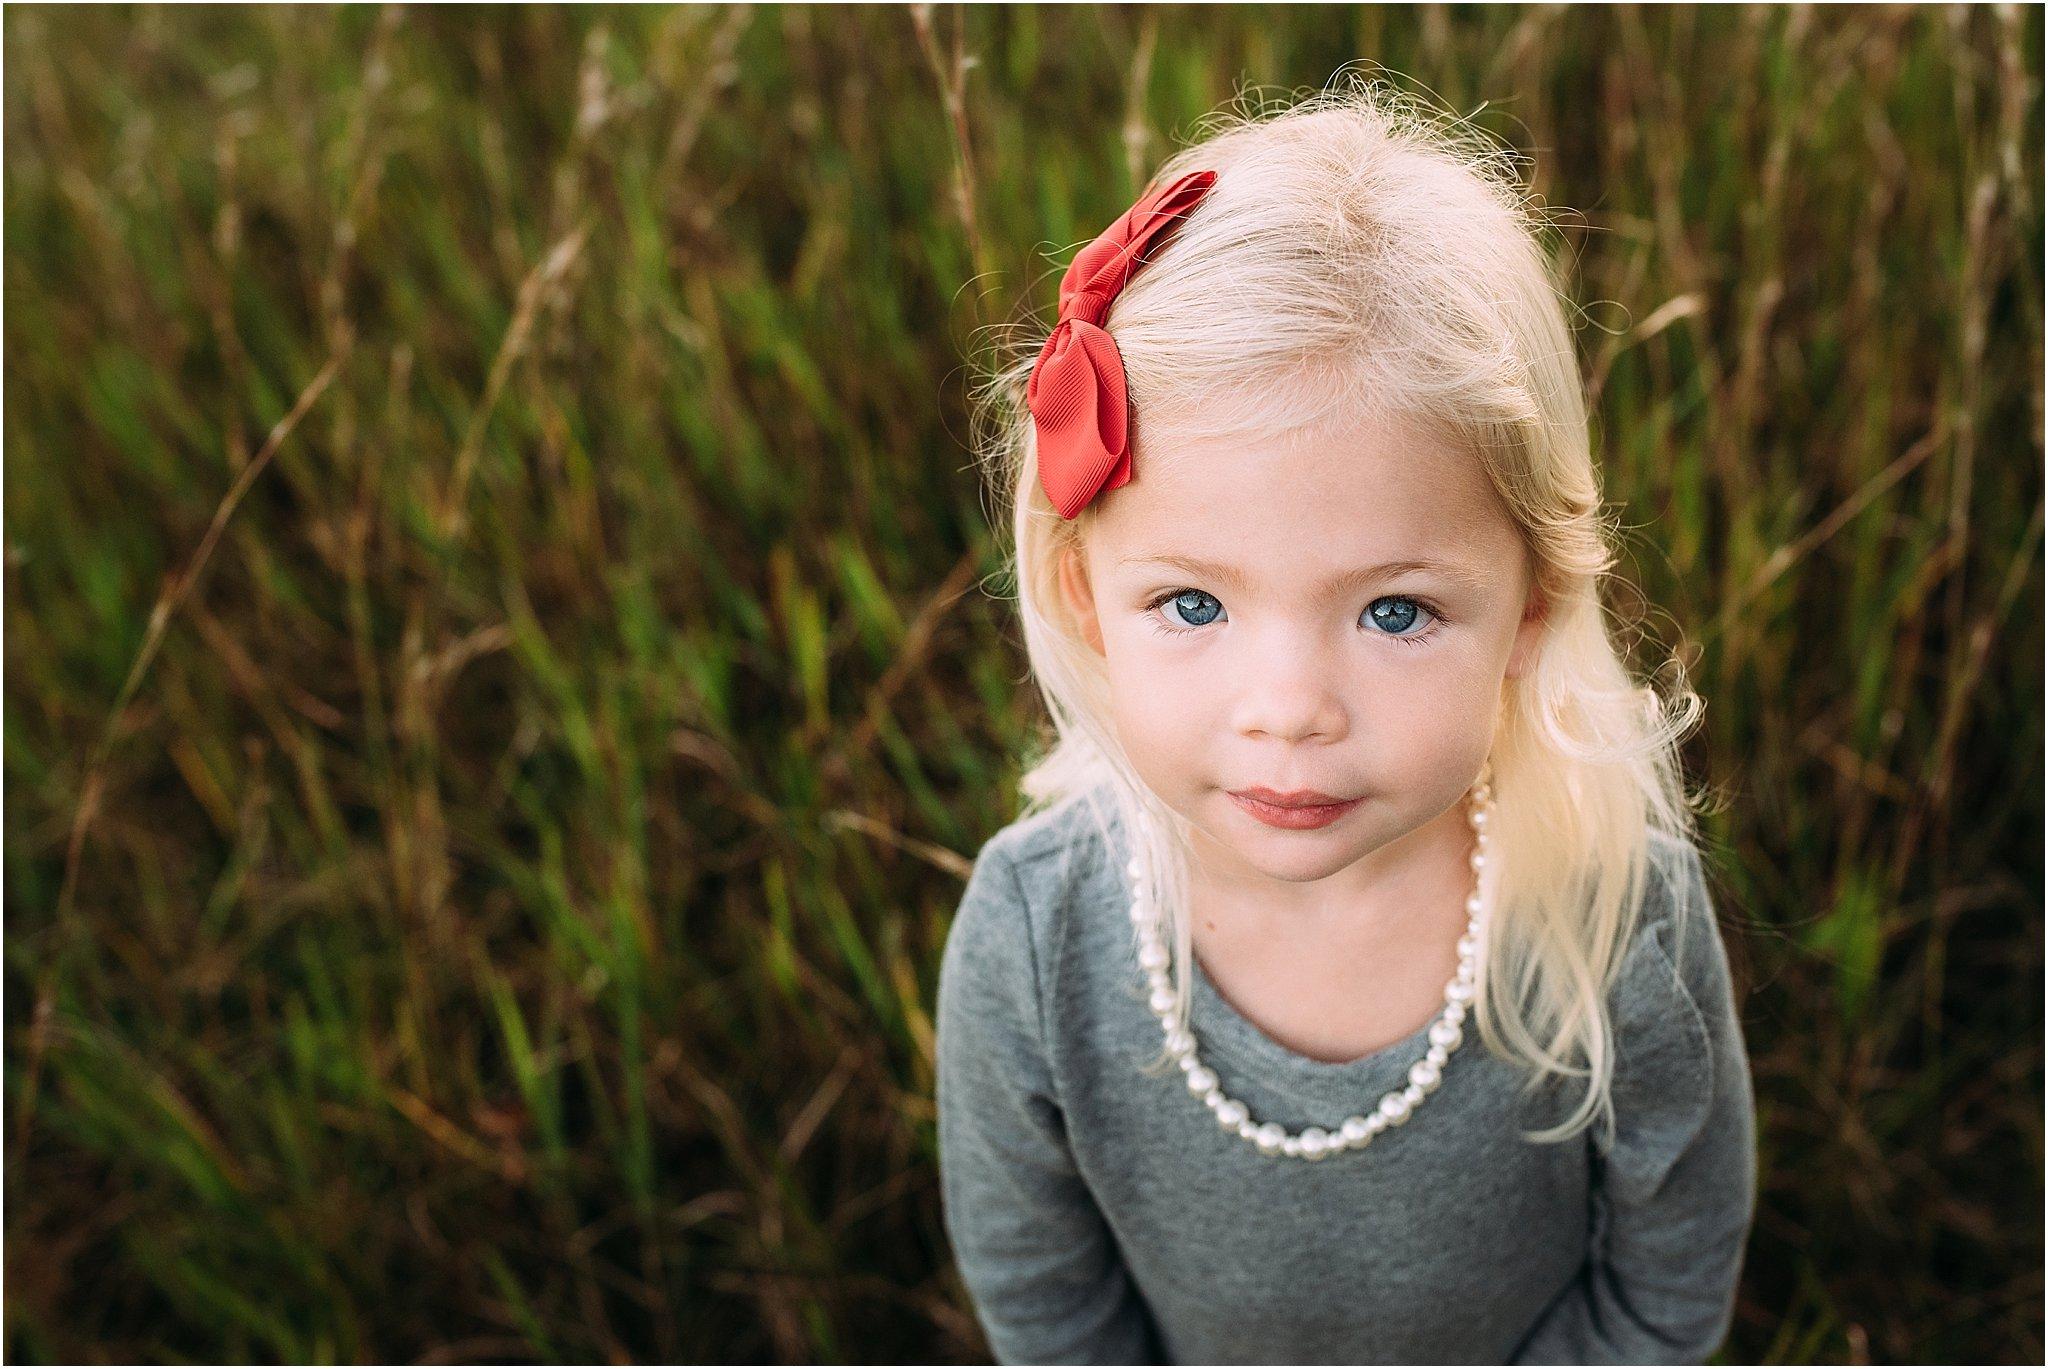 Ashley_Rogers_Photography_Orlando_Non-Posed_Newborn_Family_Lifestyle_Photographer_0184.jpg